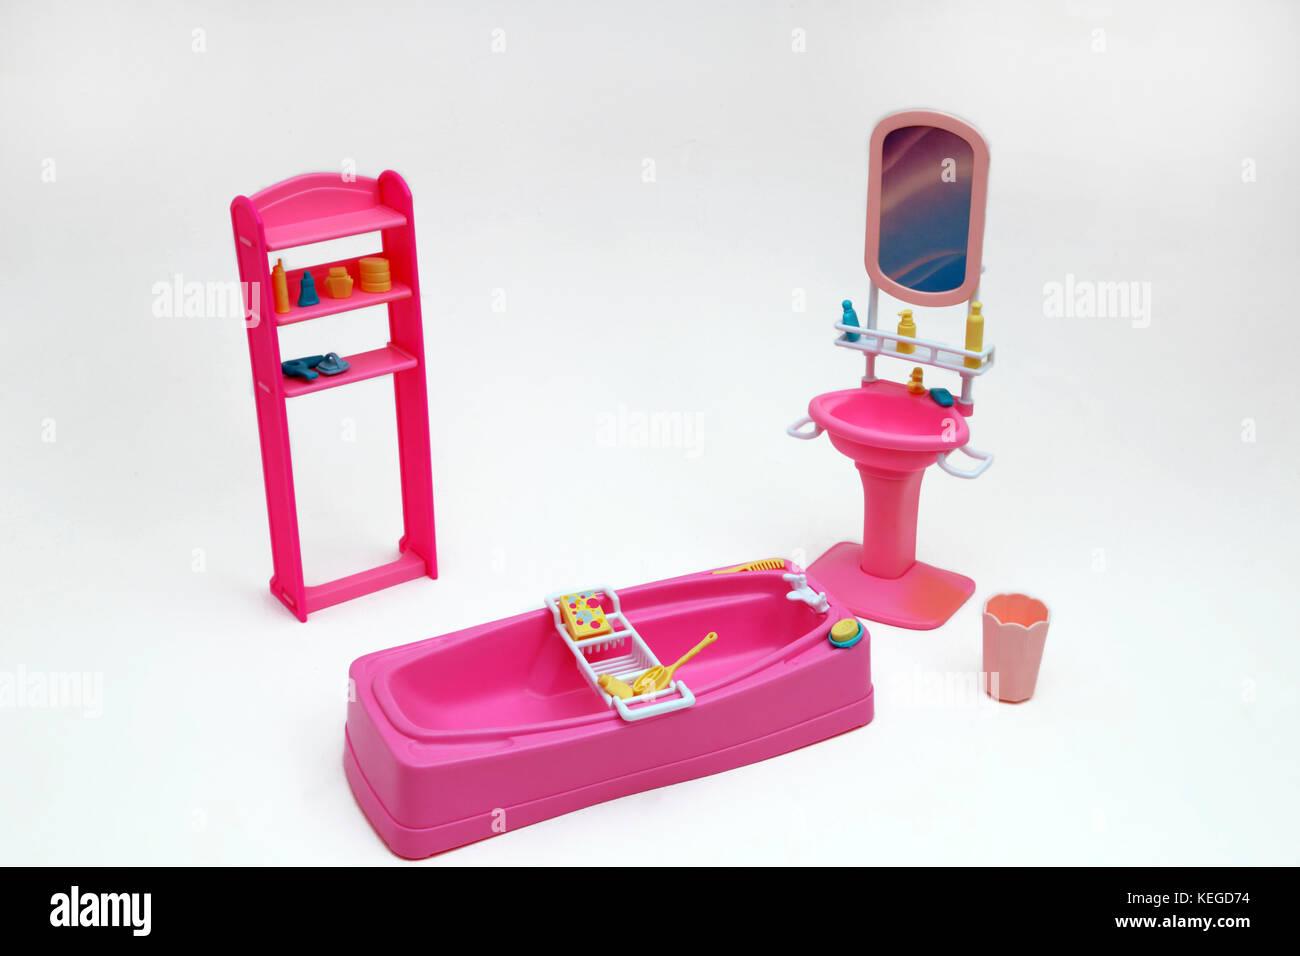 Vasca Da Bagno Barbie : Casa villa di barbie tutto per i bambini in vendita a caserta